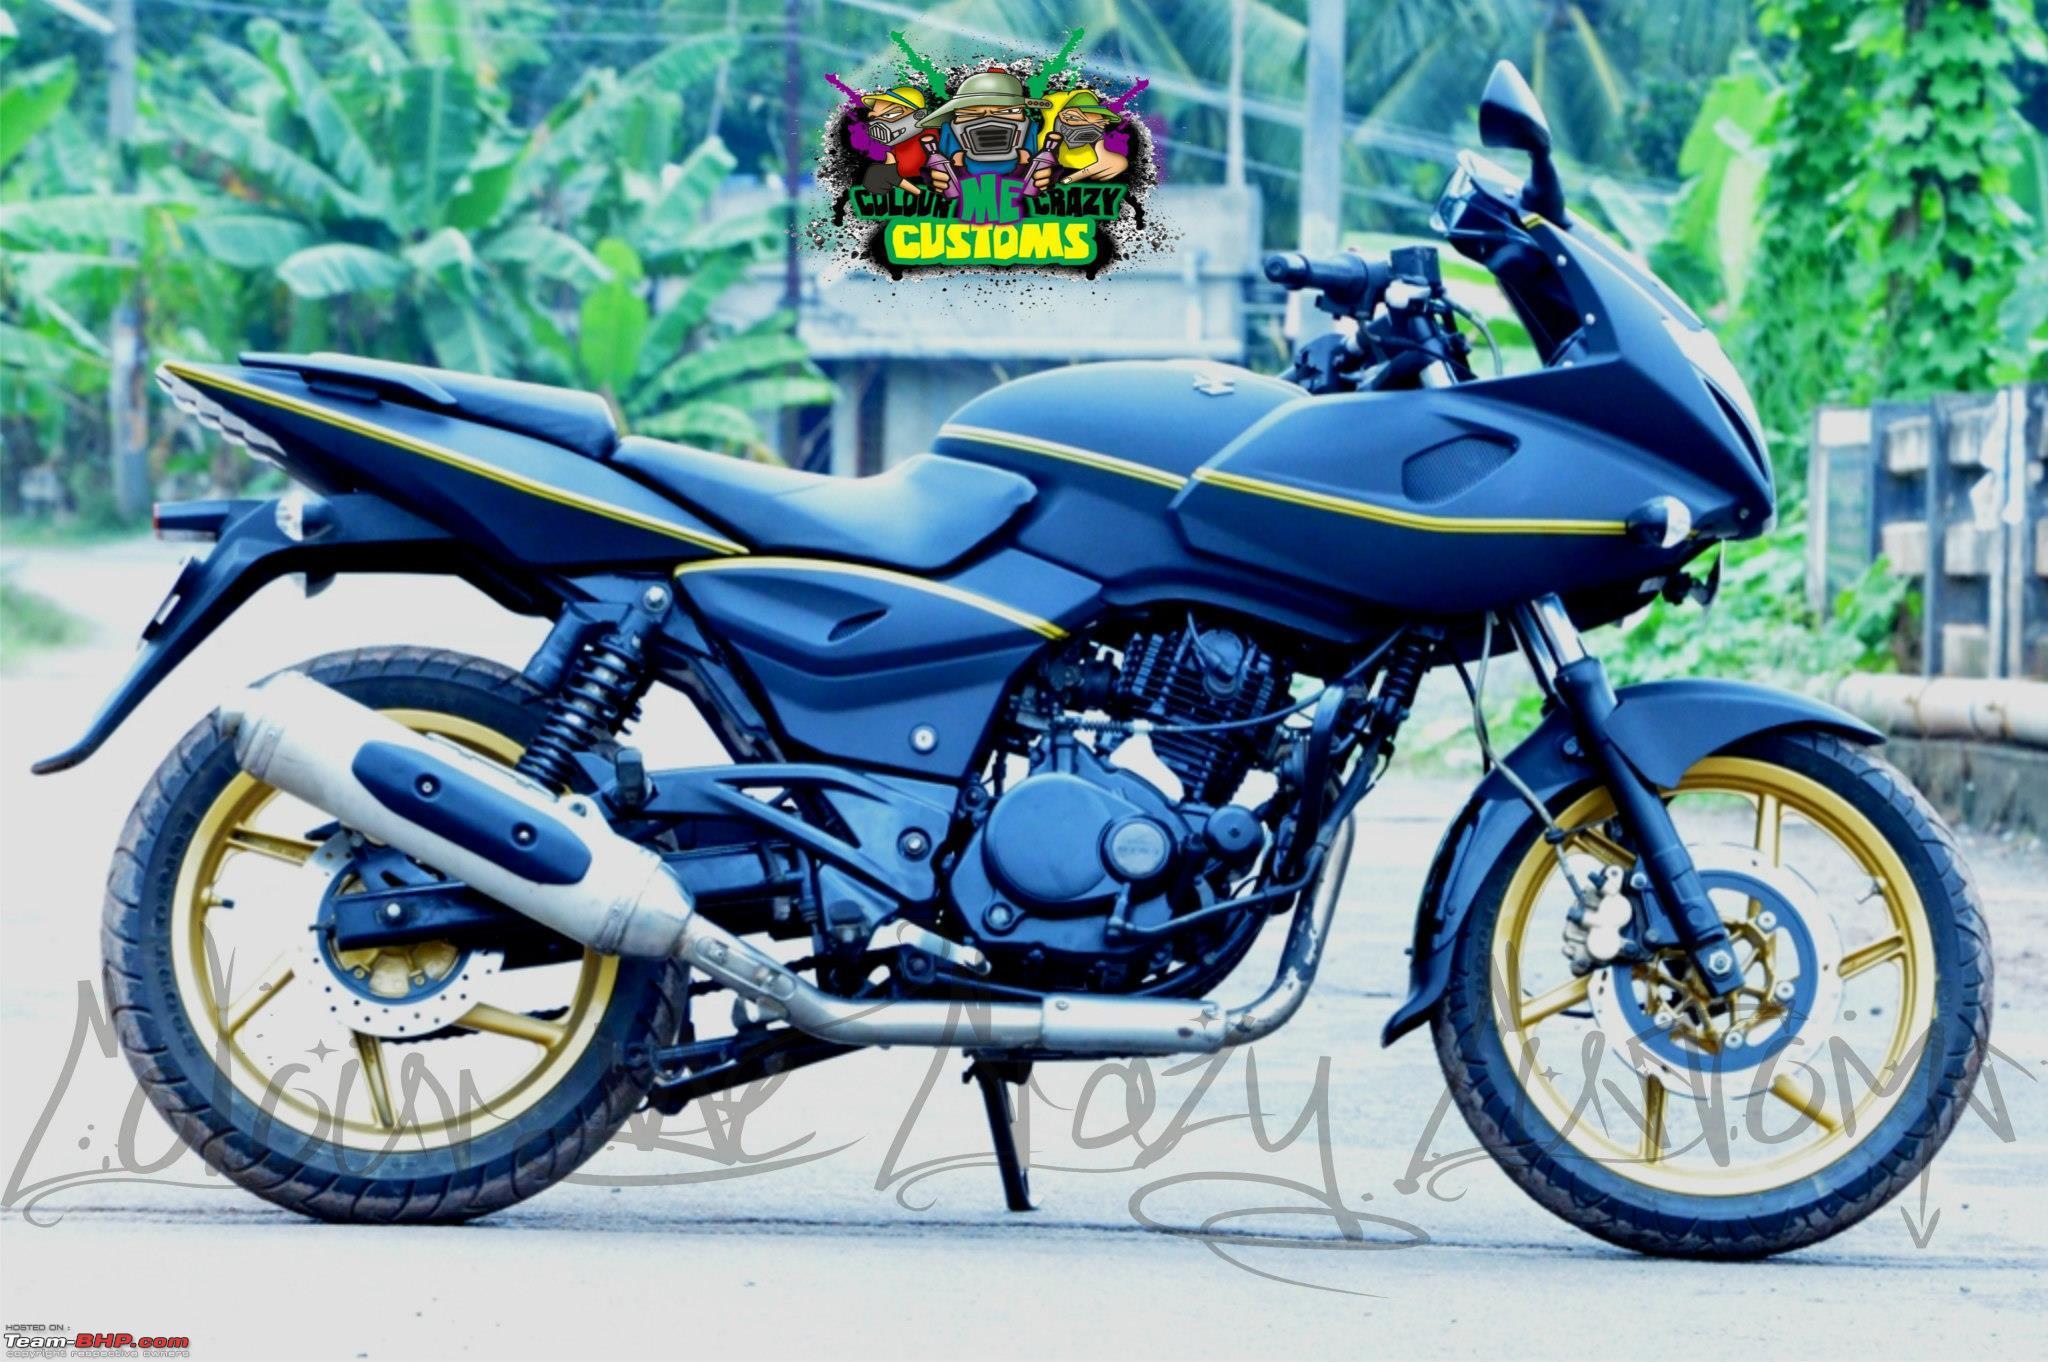 Car sticker design in bangalore - Cars Bikes Helmets Whatever 77528_373252636088813_1363776284_o Jpg